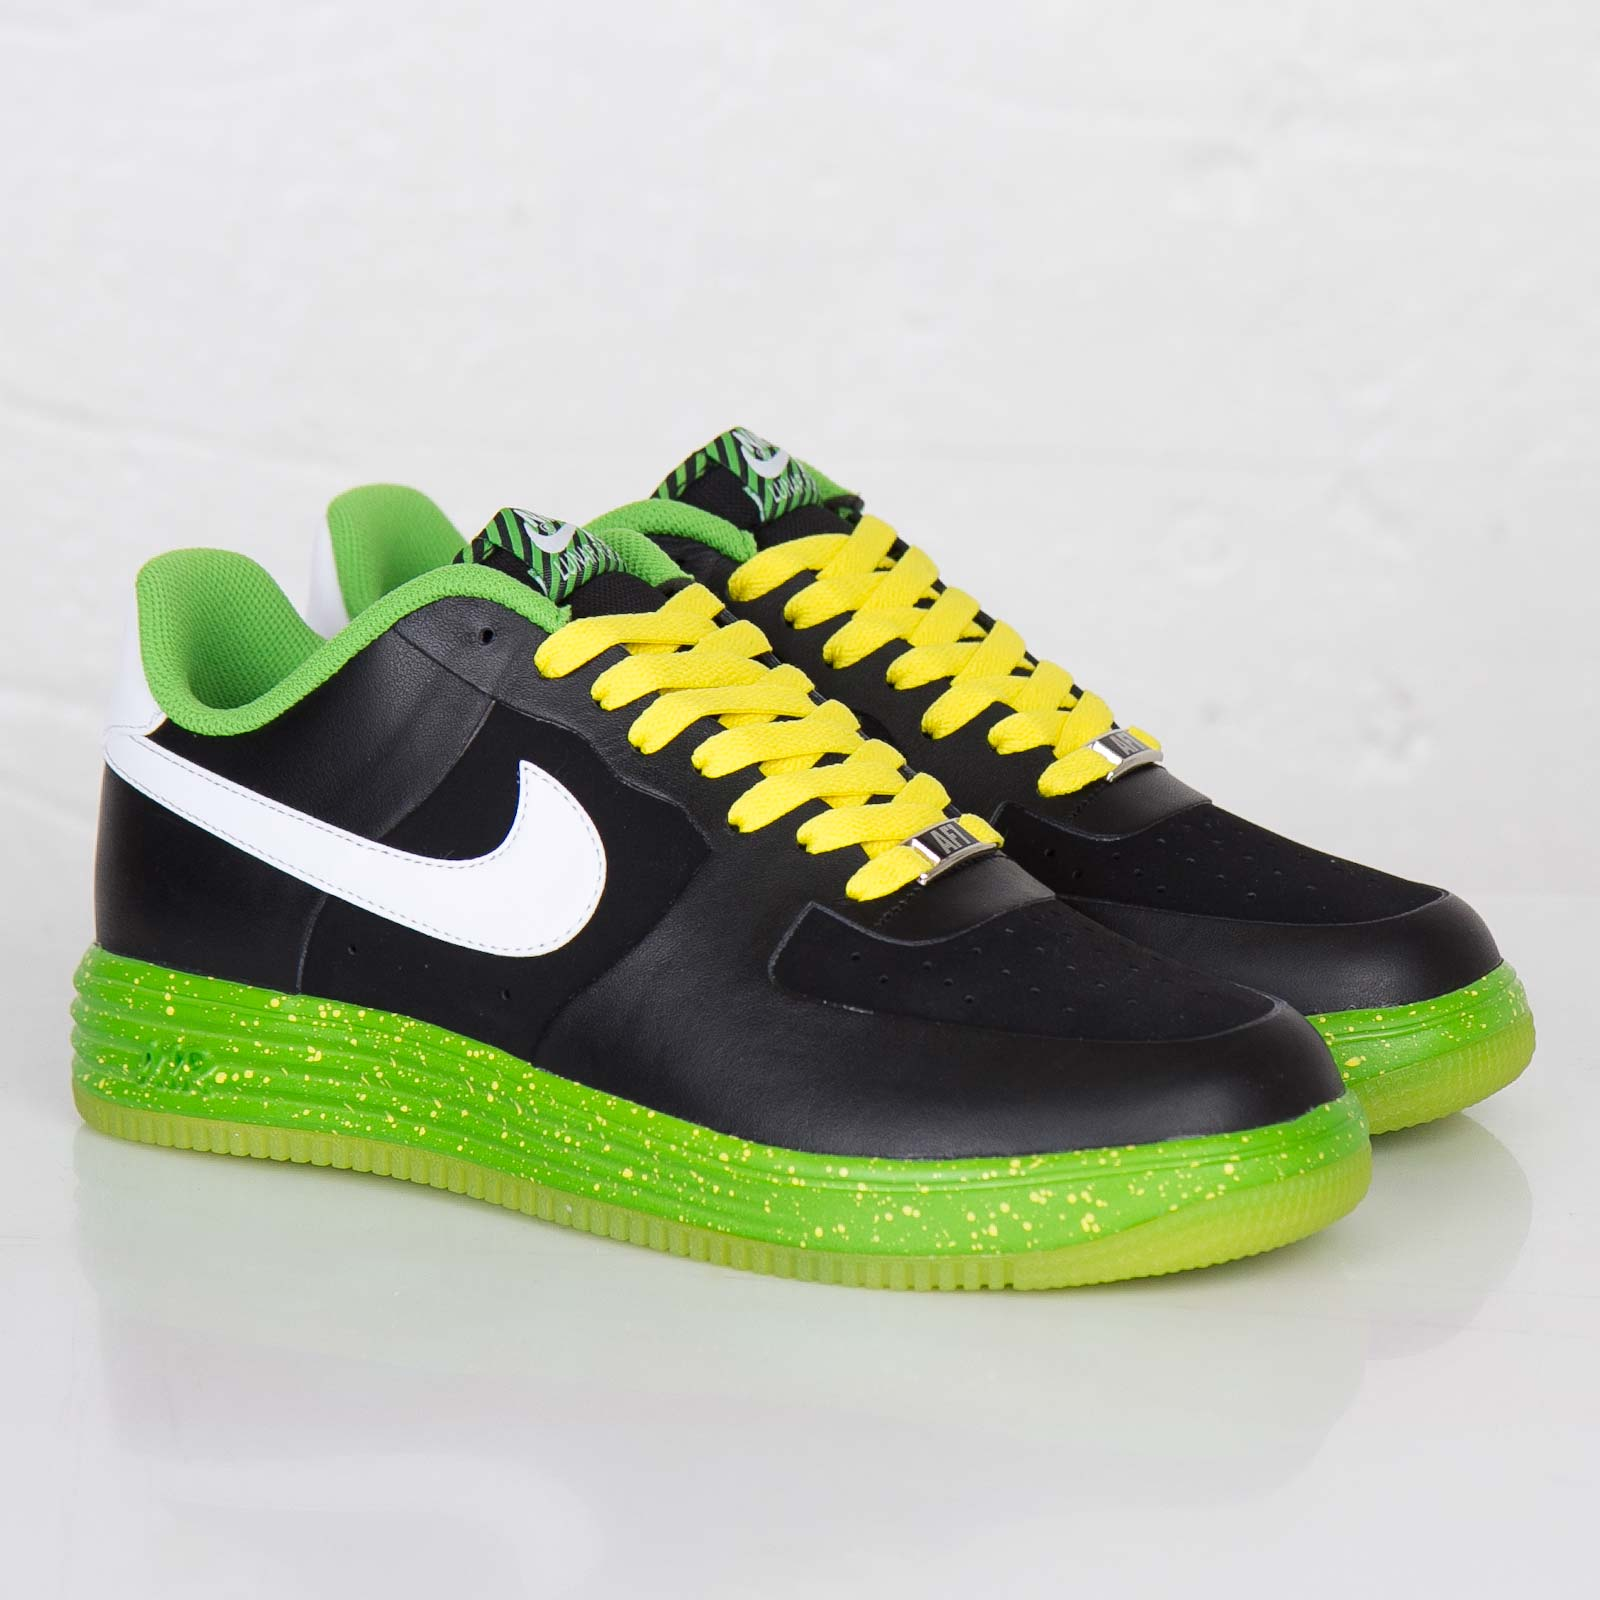 sale retailer 72c55 91d86 Nike Lunar Force 1 NS Premium - 629970-001 - Sneakersnstuff ...